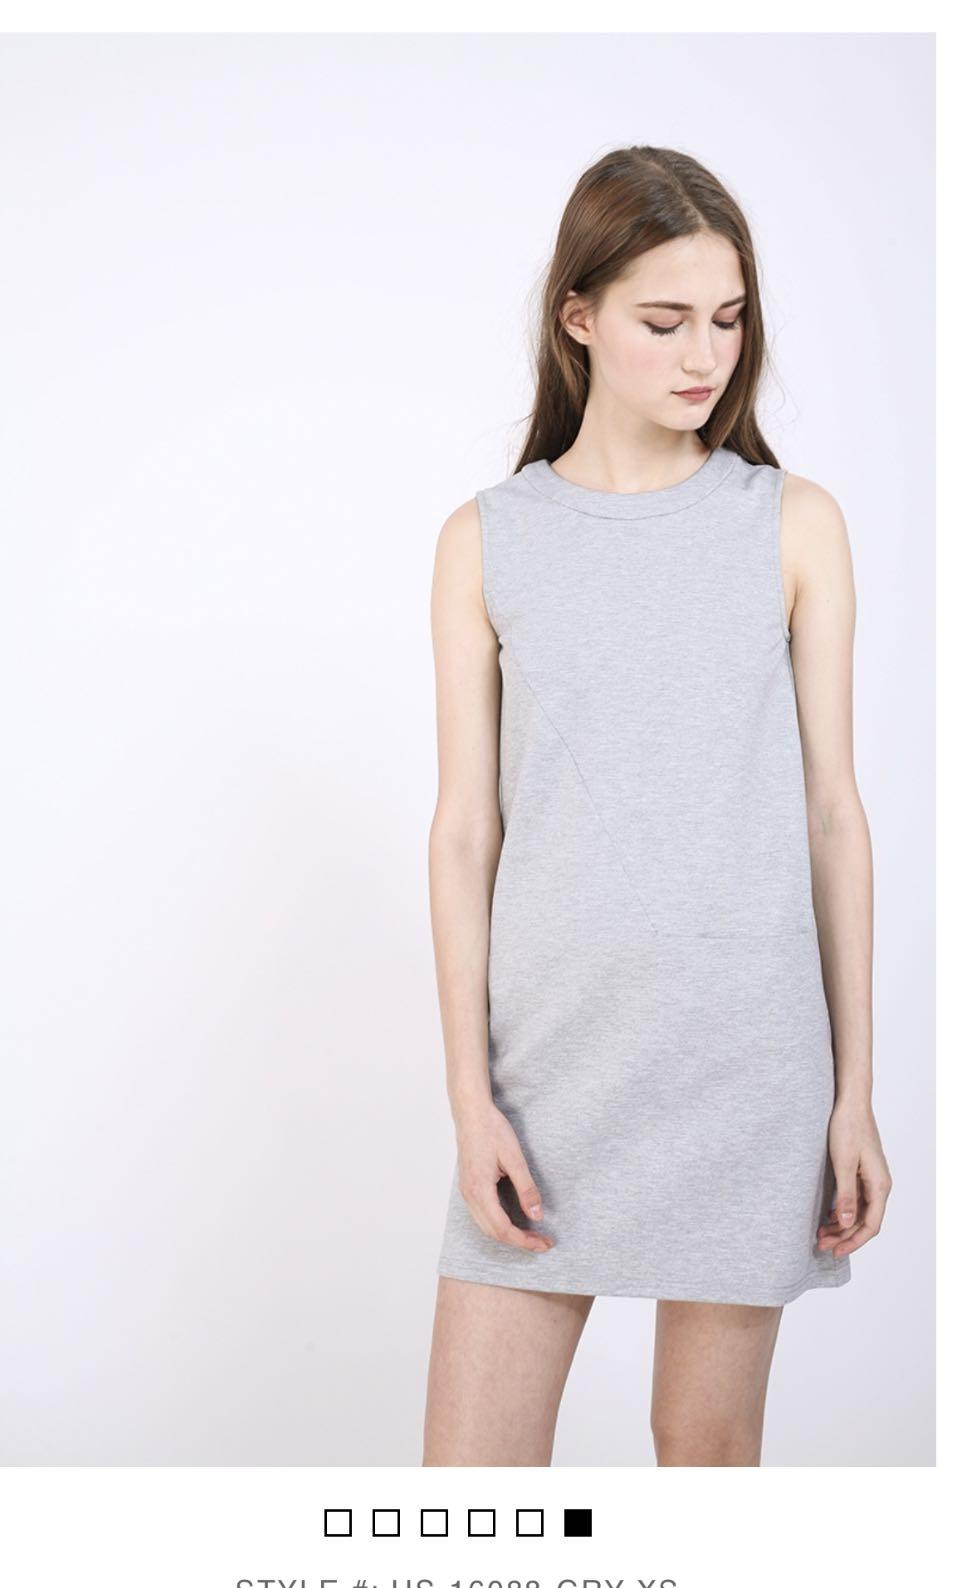 7fe64d0e67e3 Fenella dress grey XS RWB, Women's Fashion, Clothes, Dresses ...